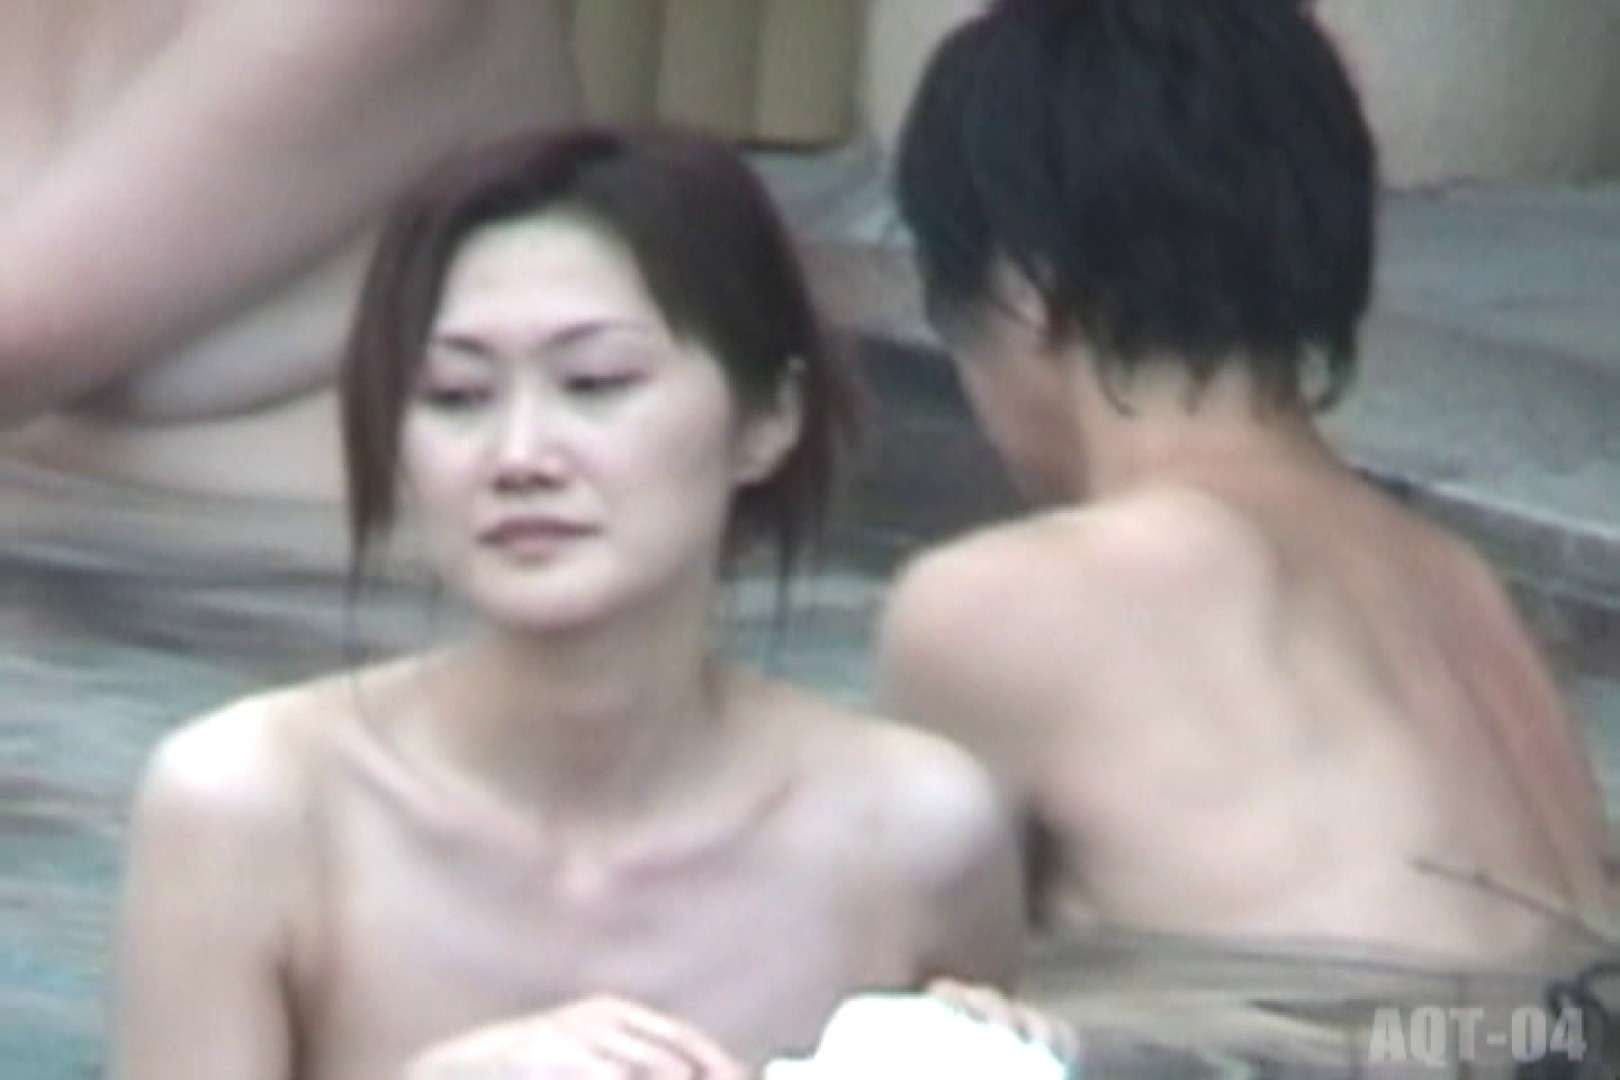 Aquaな露天風呂Vol.739 いやらしいOL | 0  71連発 69